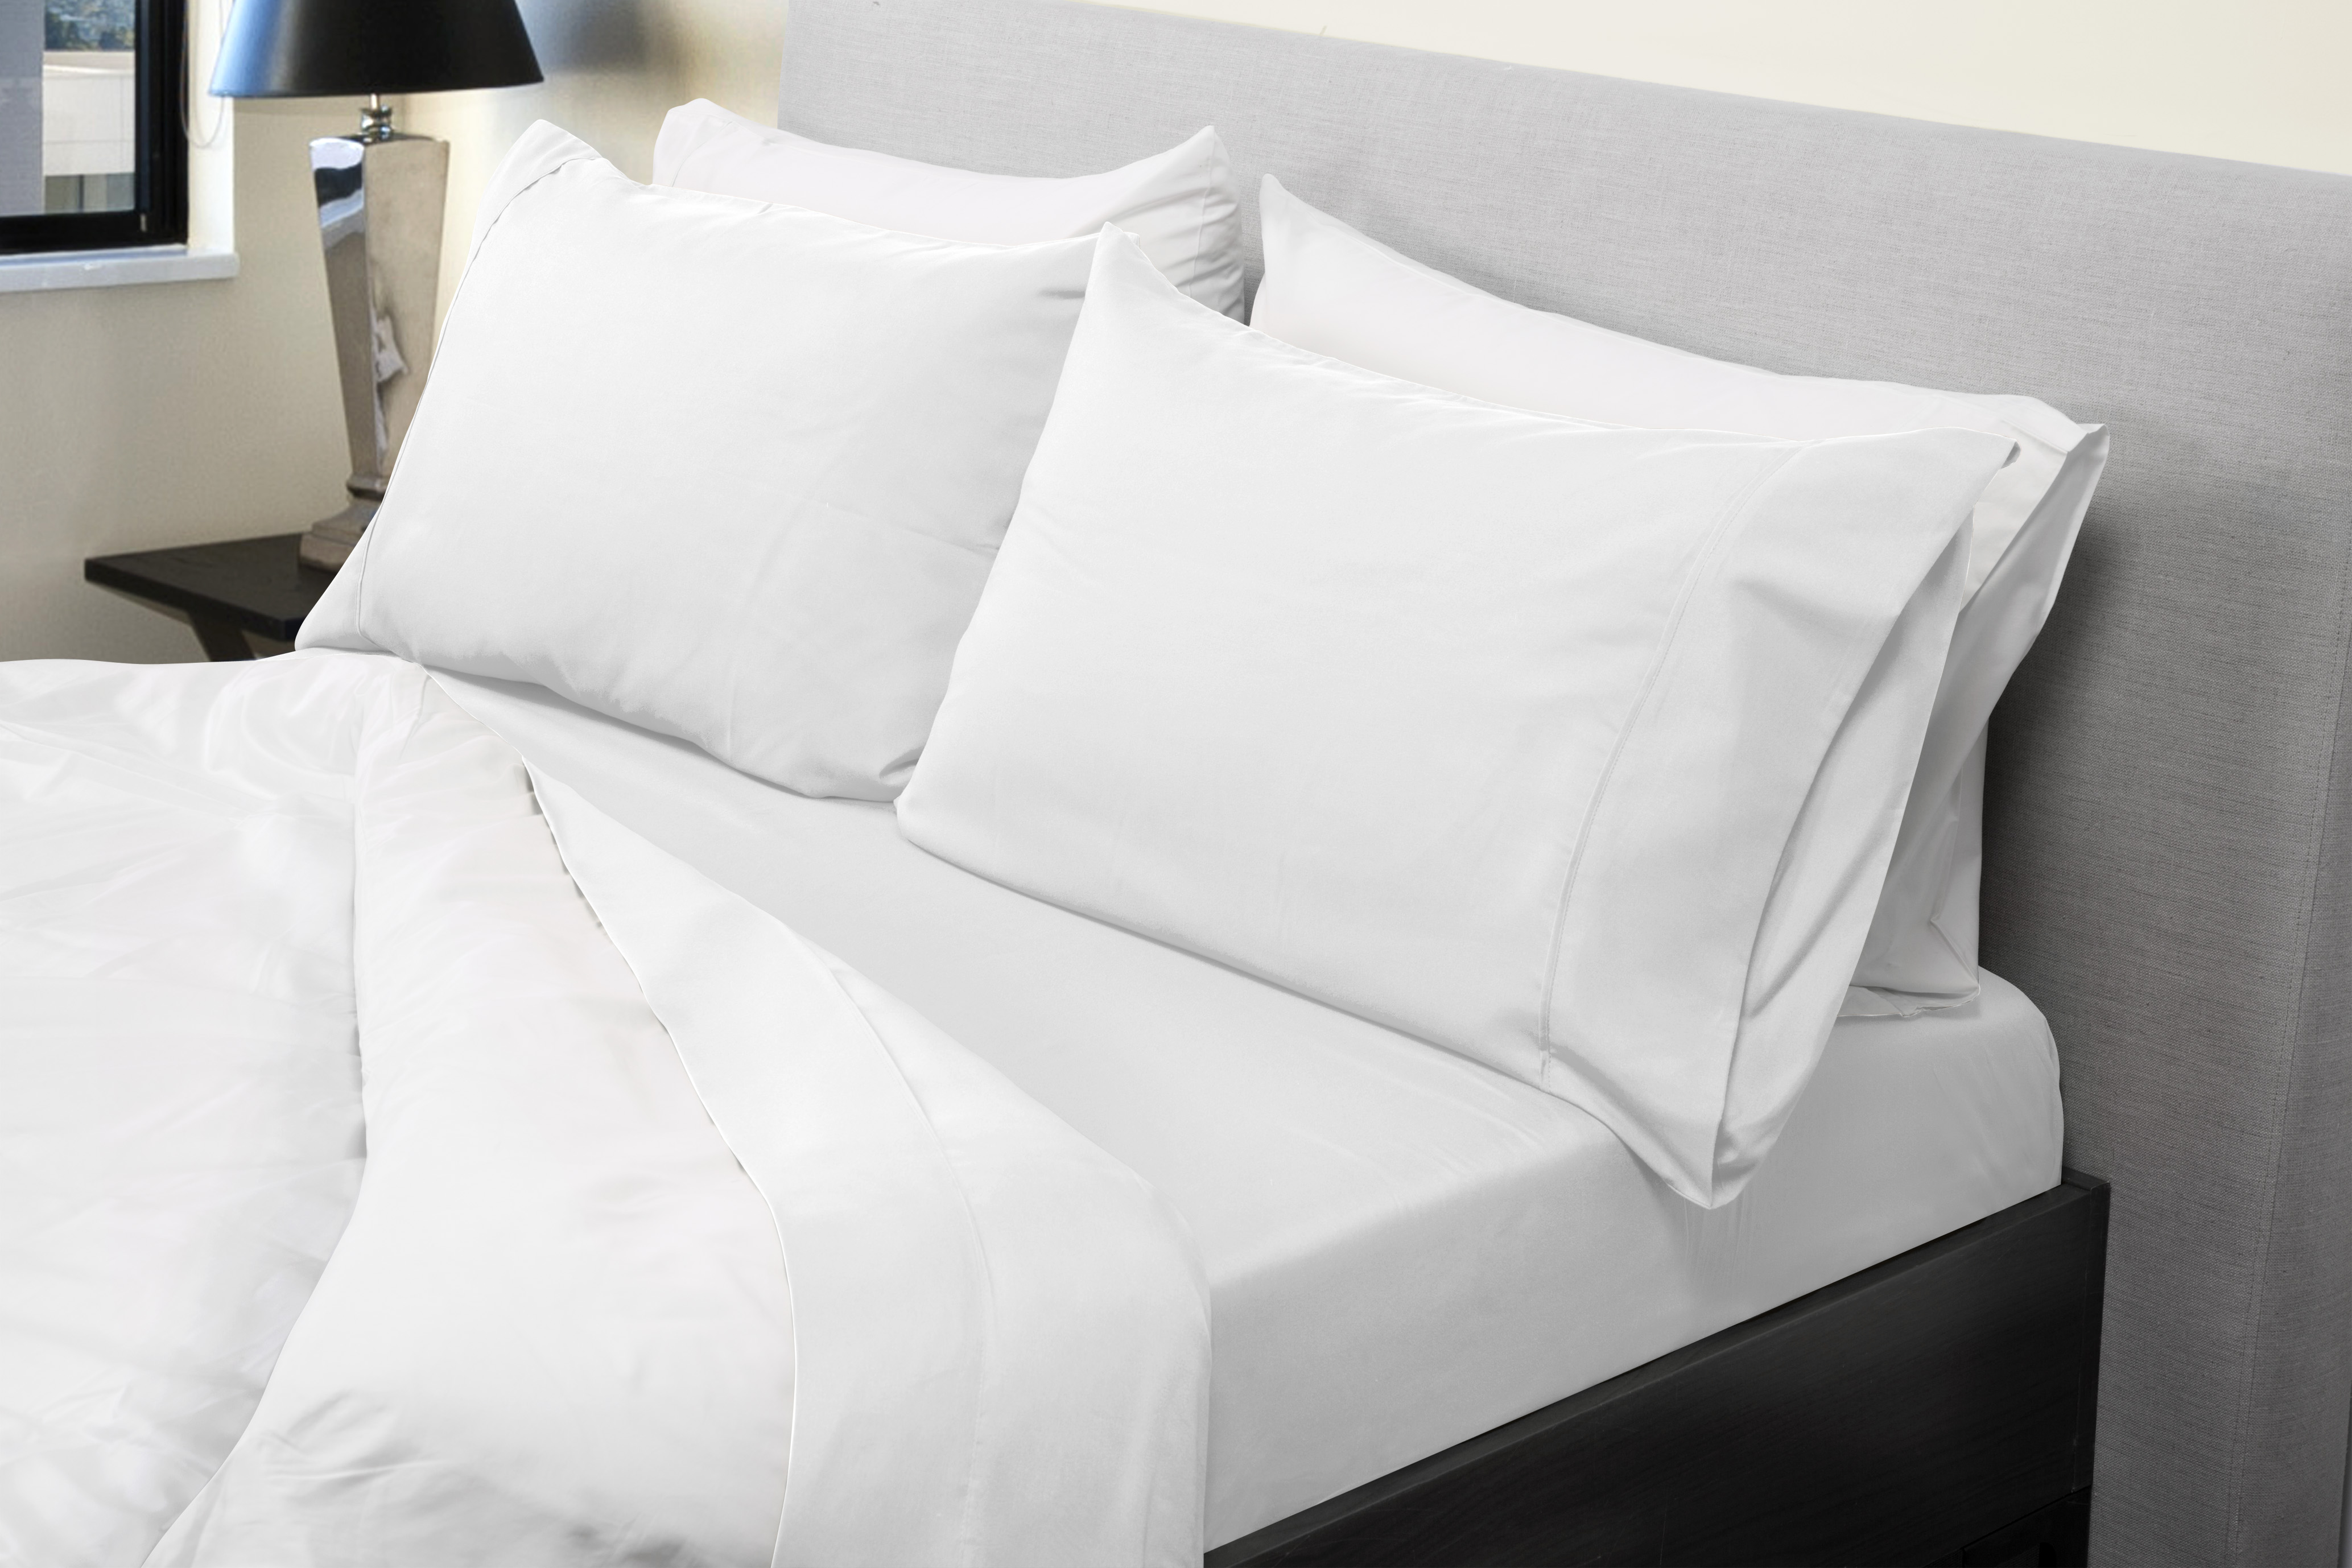 New Bed Sheets Set 1000TC Bamboo Blend Flat